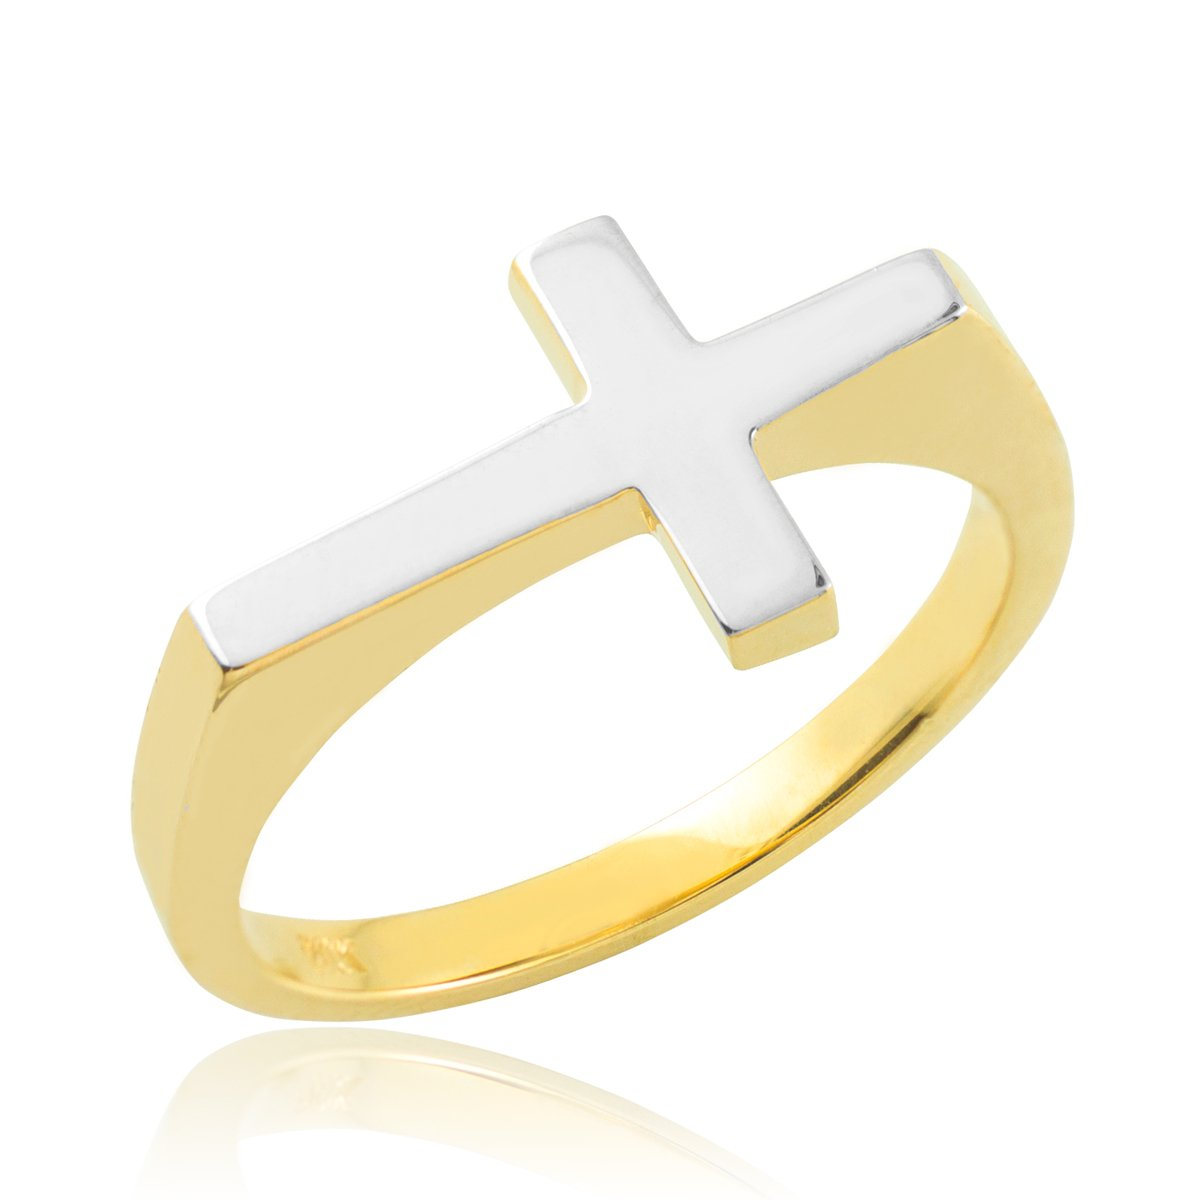 10k Two-Tone Gold High Polish Band Flat Top Sideways Cross Ring (Size 6)